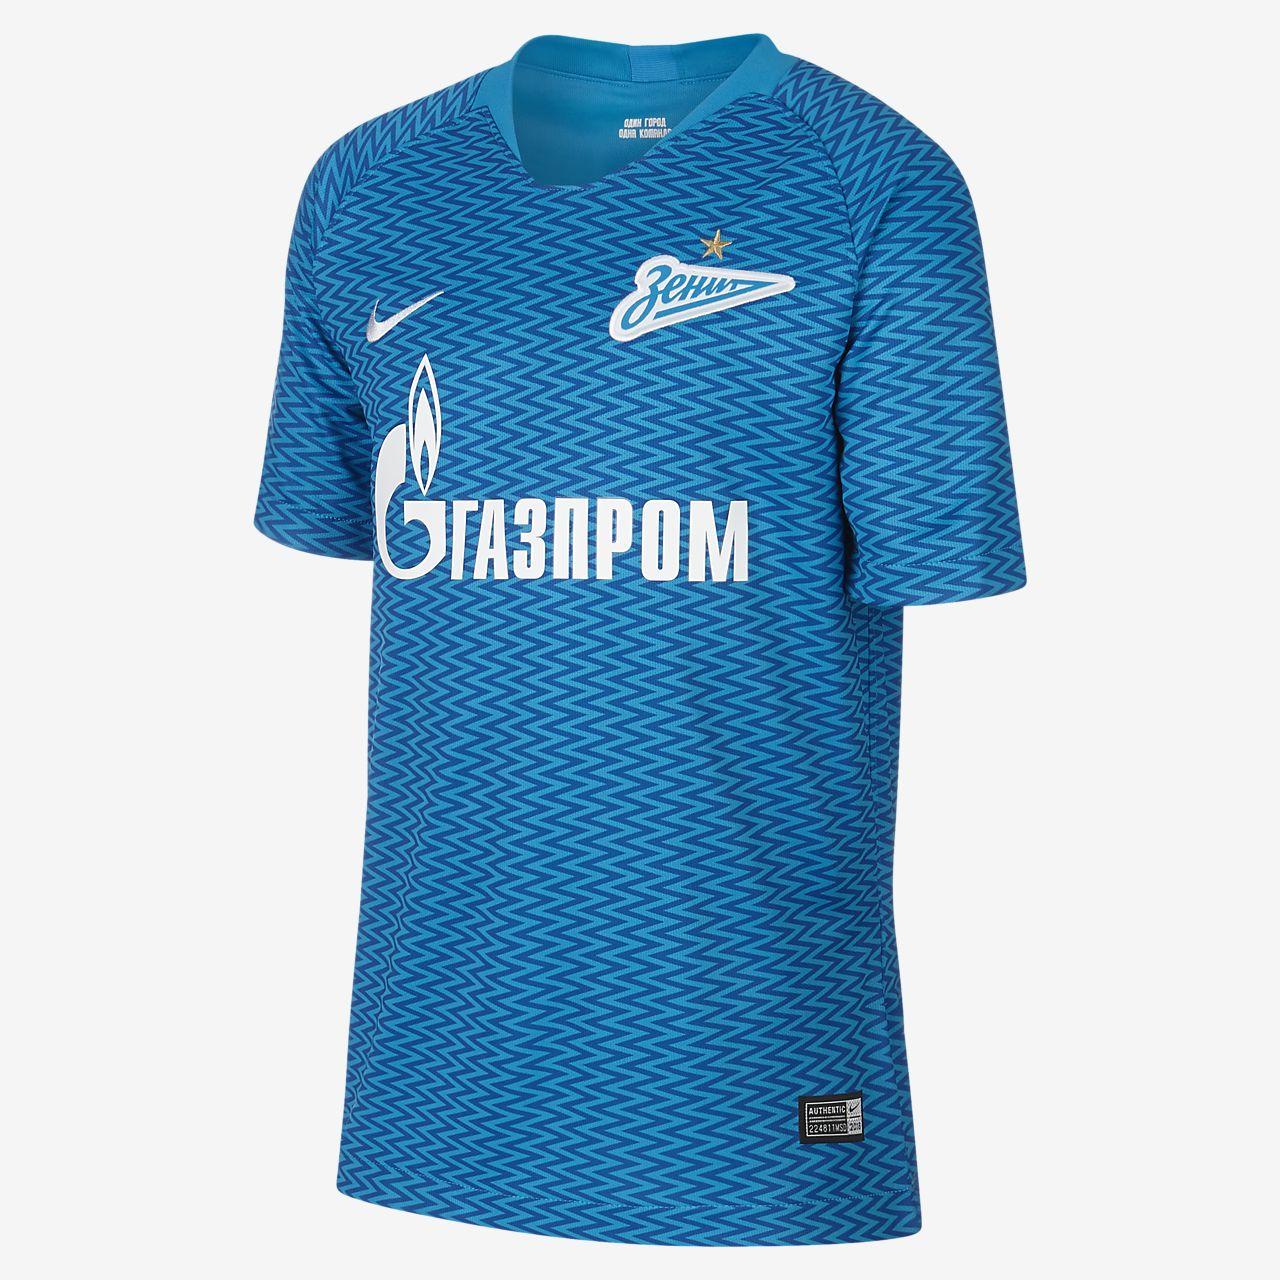 Camiseta de fútbol para niños talla grande de local Stadium del FC Zenit 2018/19